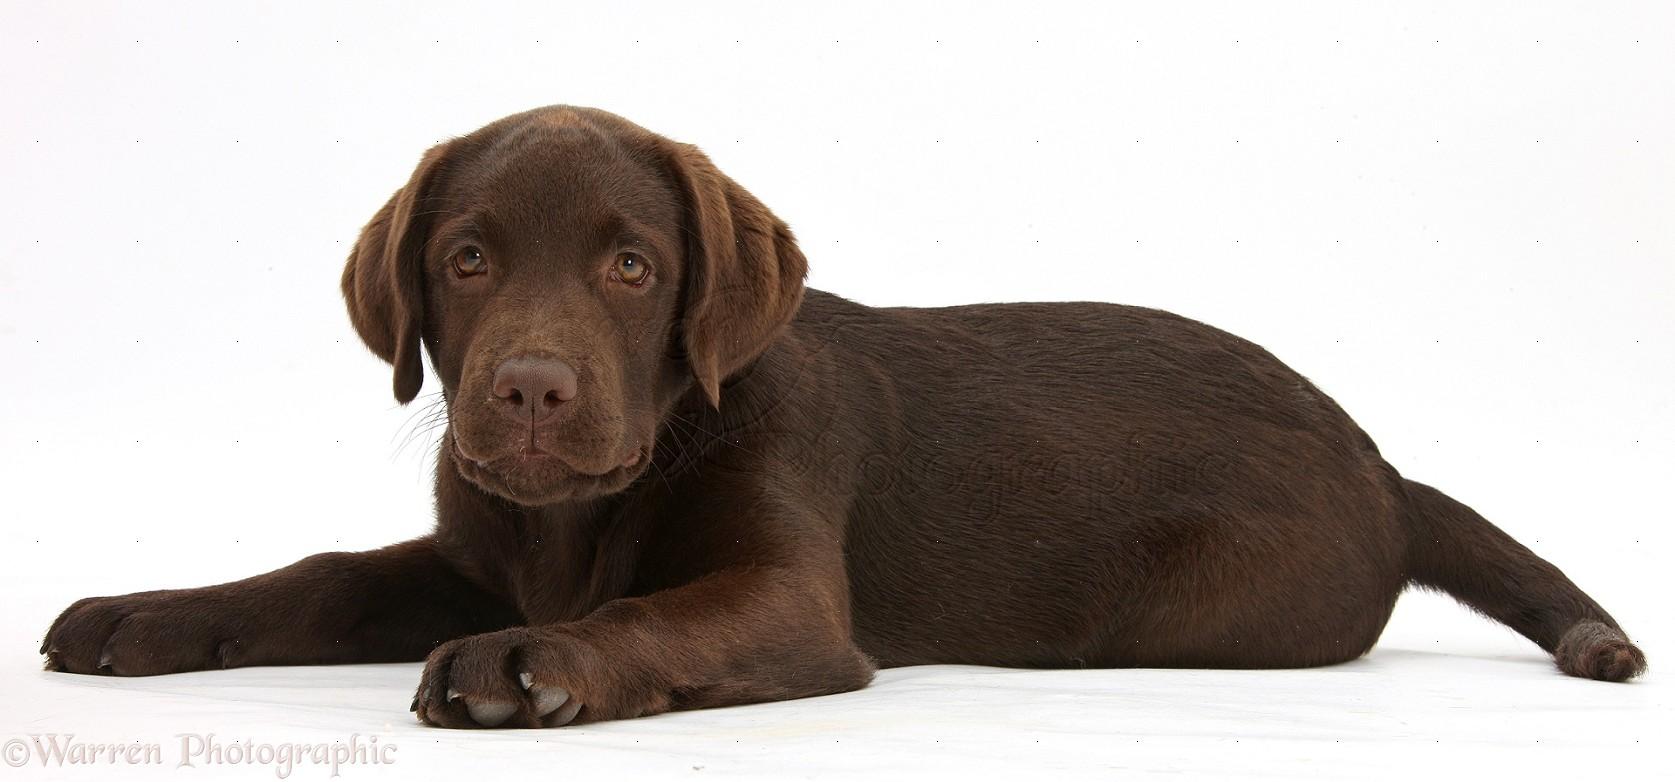 29422 Chocolate Labrador pup white backgroundjpg 1675782 pixels 1675x782